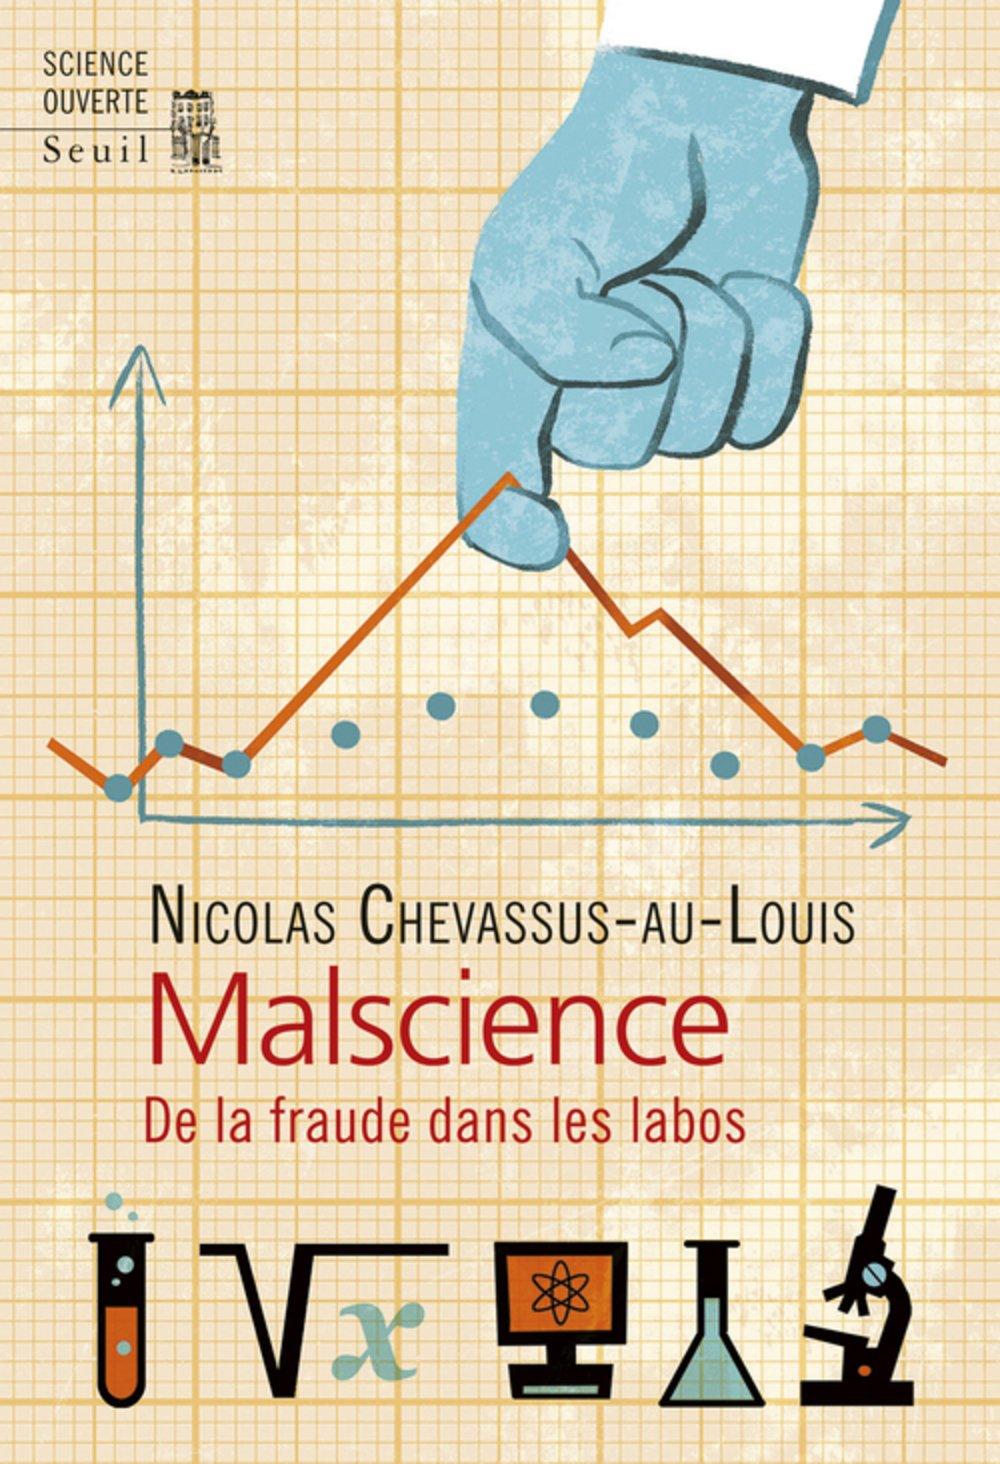 Malscience : De la fraude dans les labos - Nicolas Chevassus-au-Louis